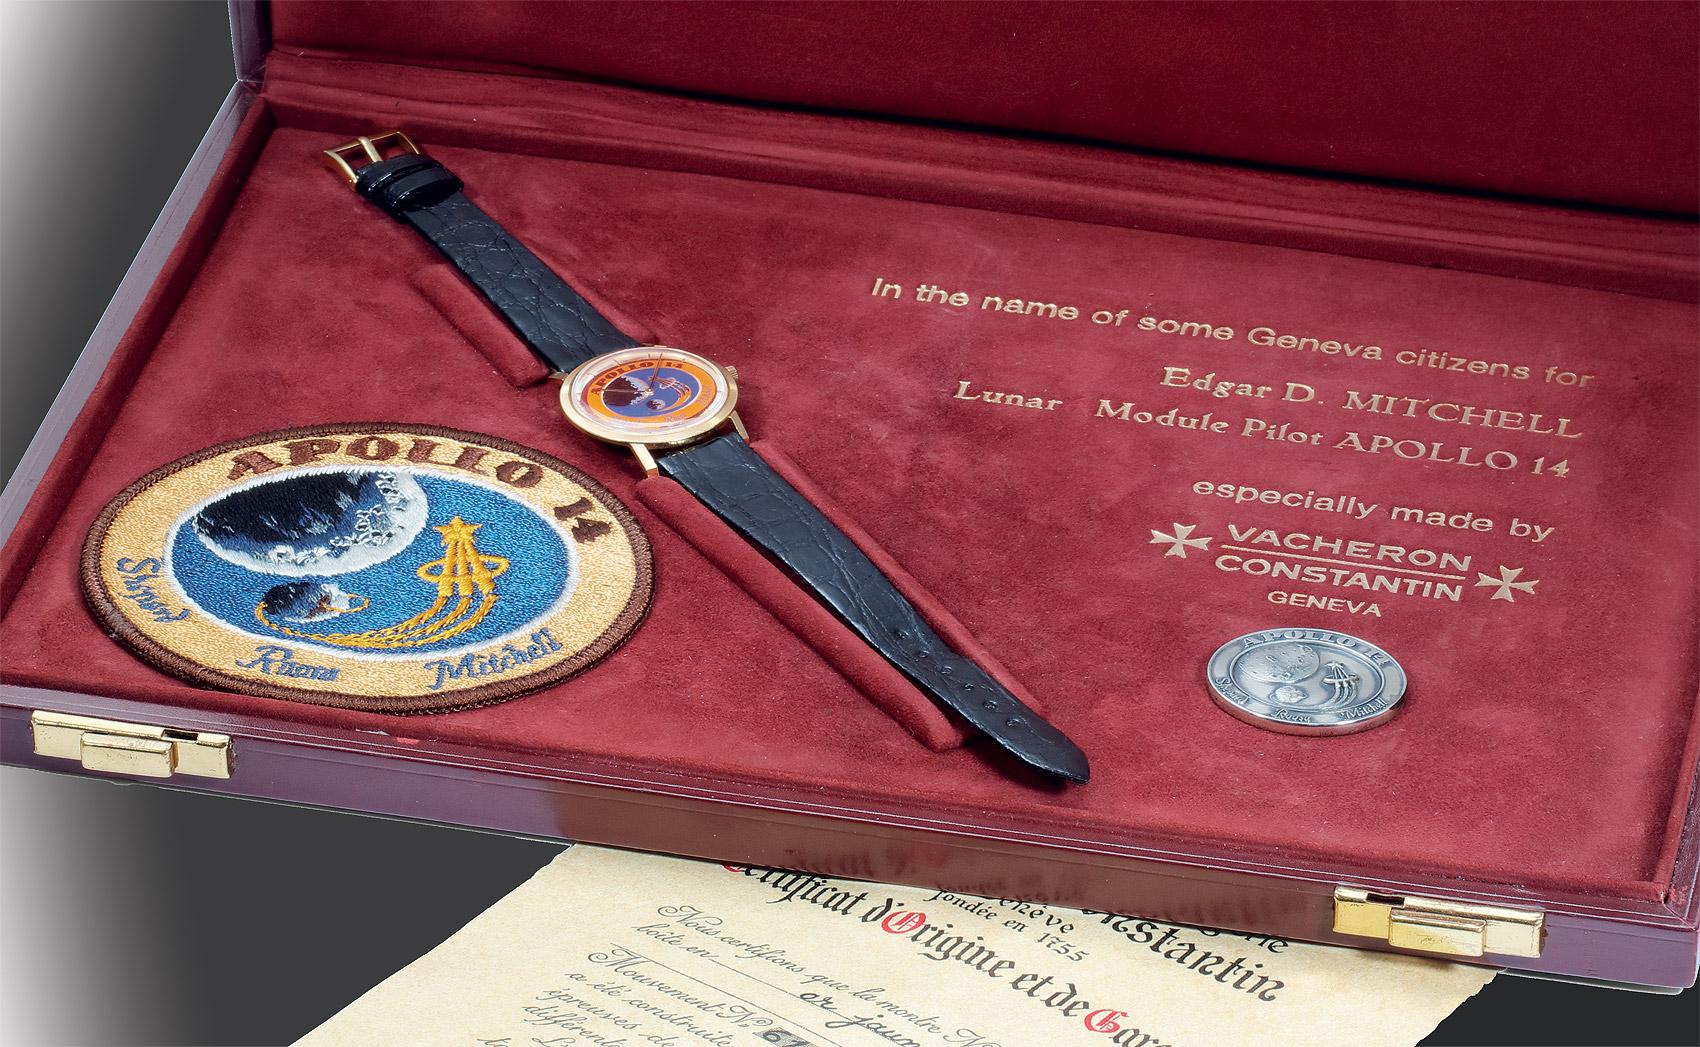 The Mysterious Vacheron Constantin Apollo 14 for Edgar Mitchell timepiece